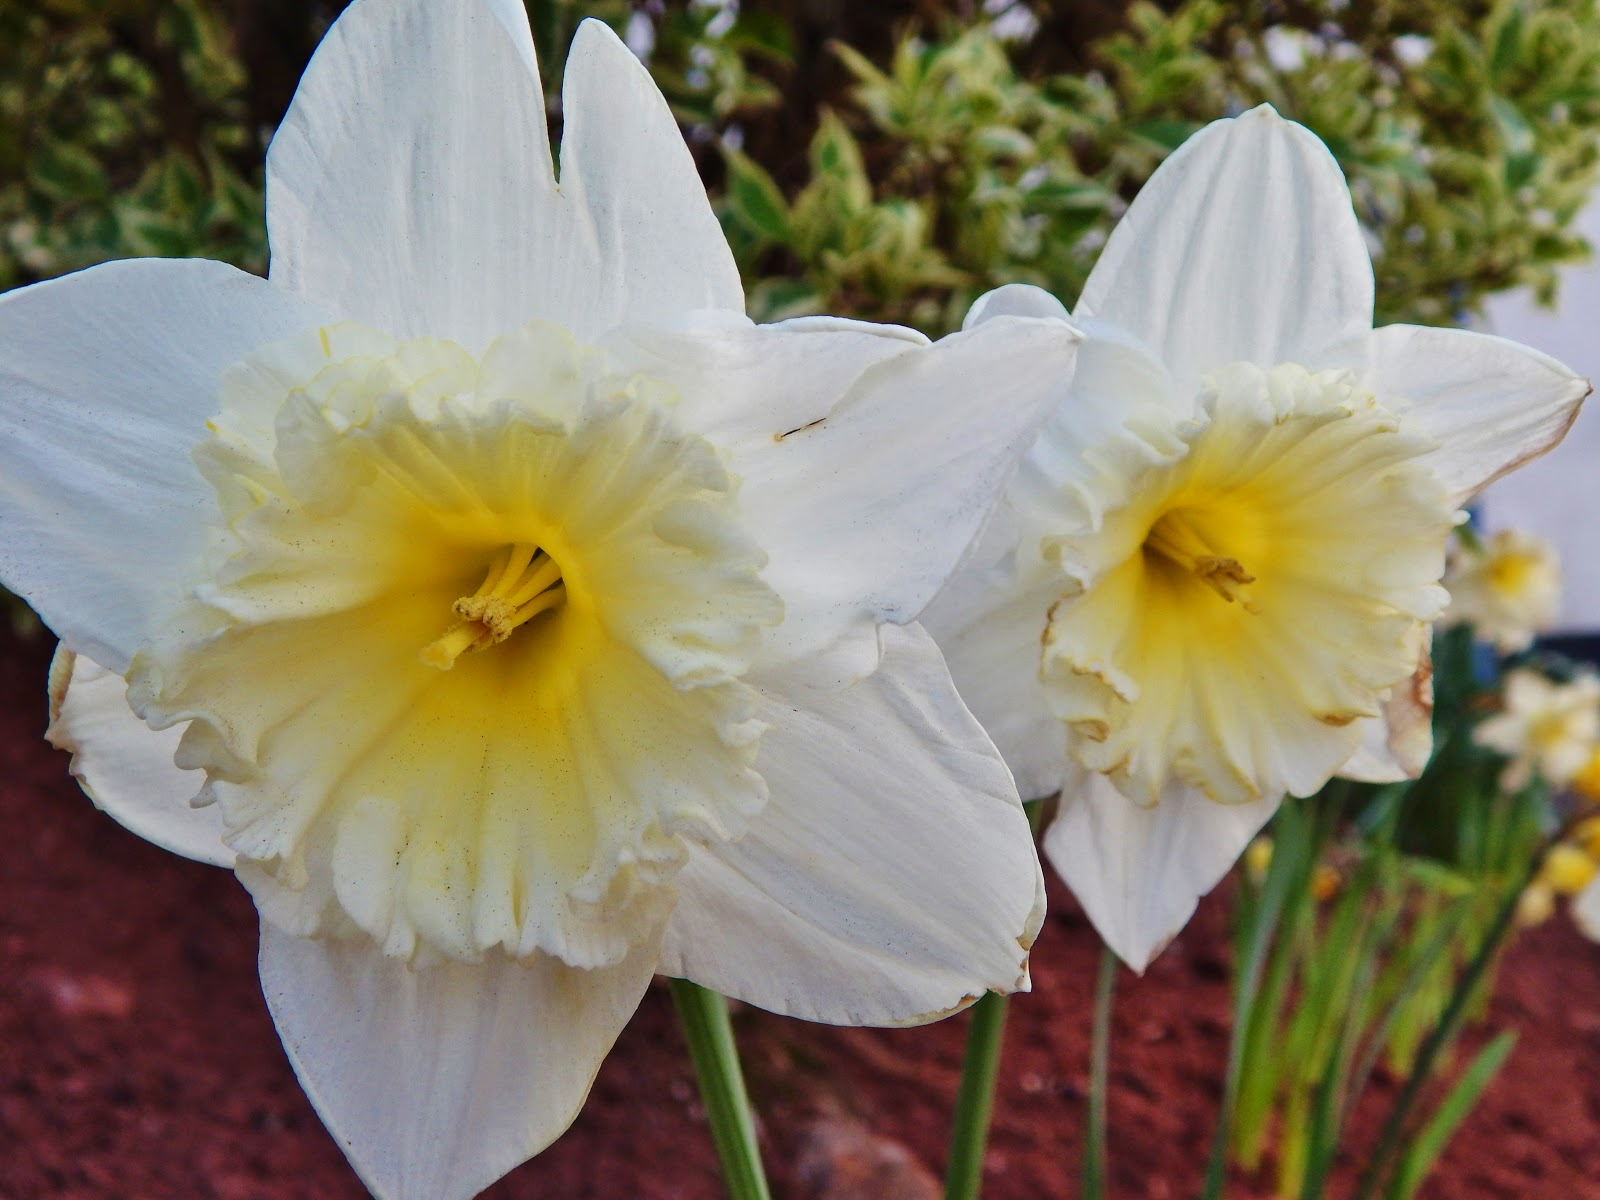 Paignton - Daffodils